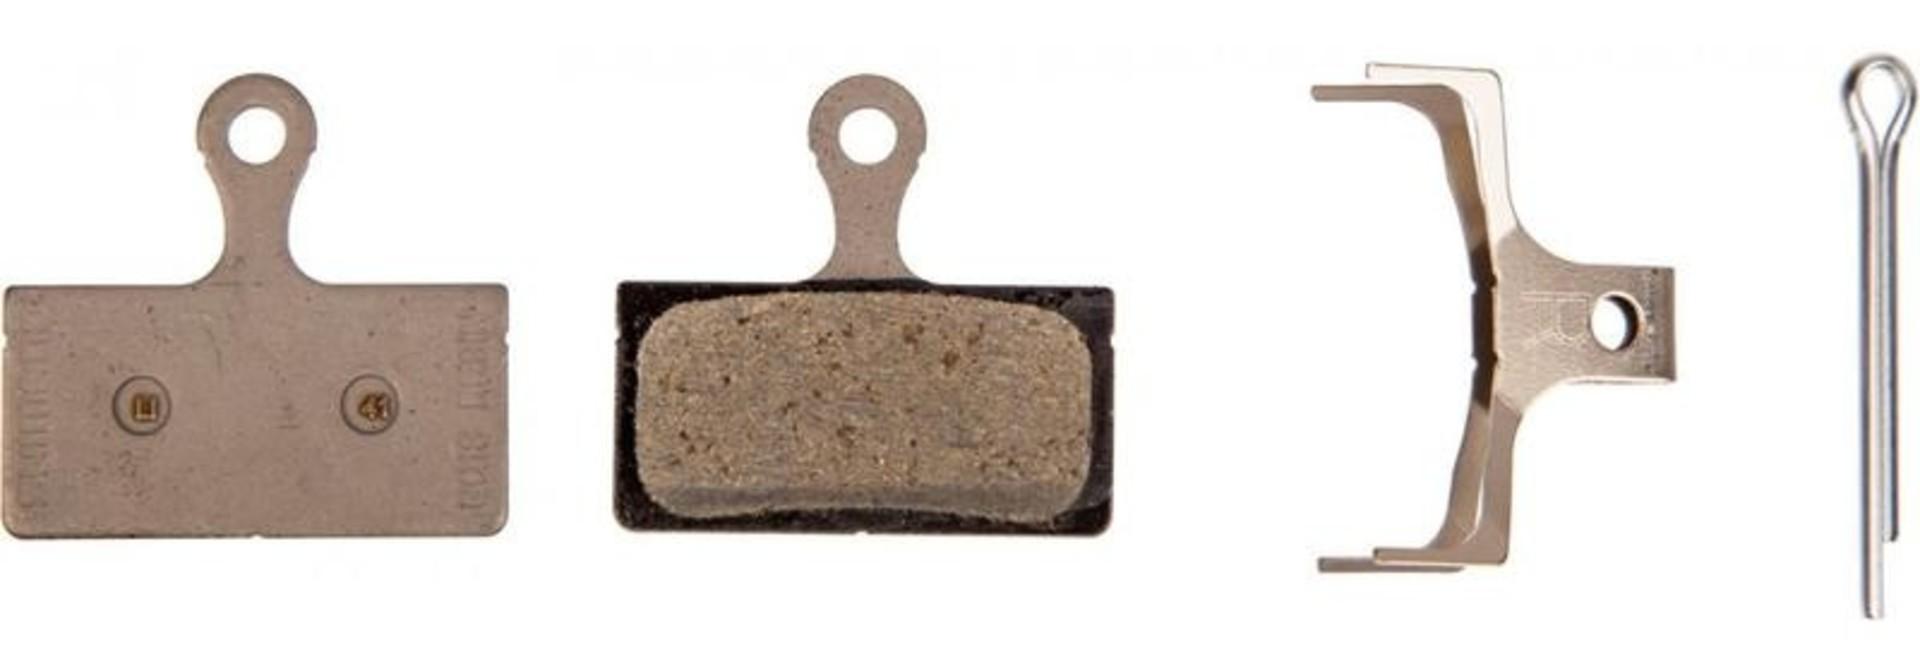 Shimano, Y8KA98010, G01S, BR-M666, Disc brake pads, Without fins, Resin, Pair, G type